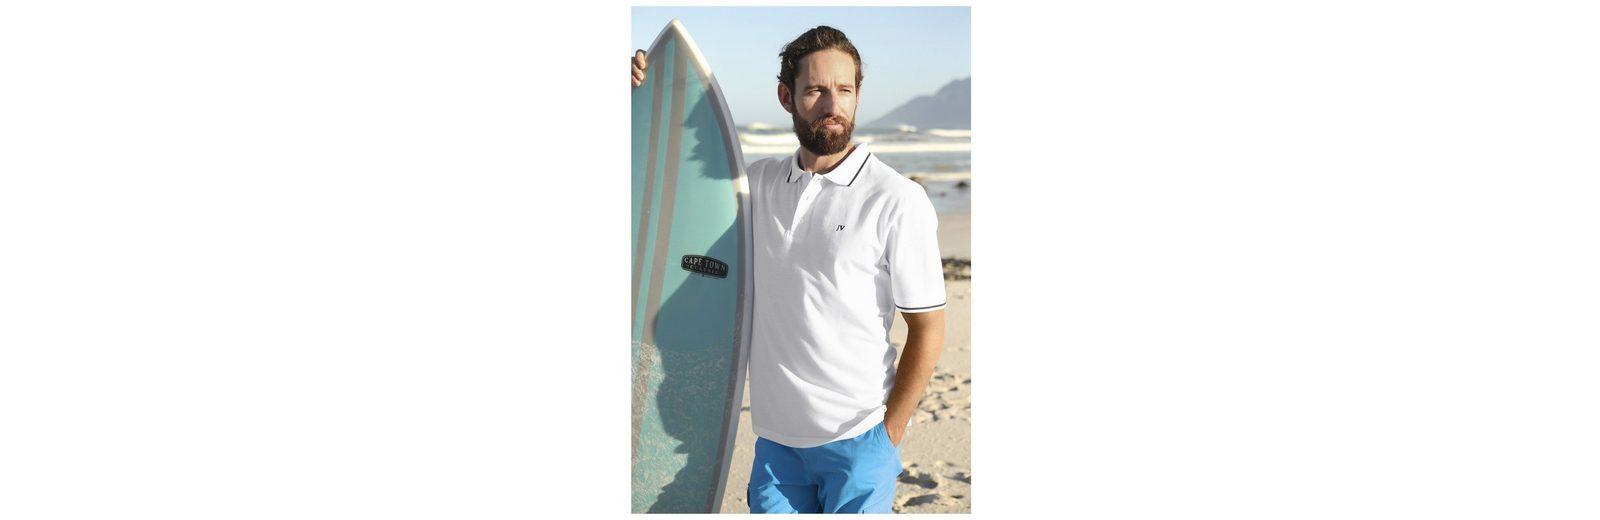 Mode-Stil Günstiger Preis Jan Vanderstorm Poloshirt SIDAR Billig Offiziellen Billige Wiki oEKpsSRvpD